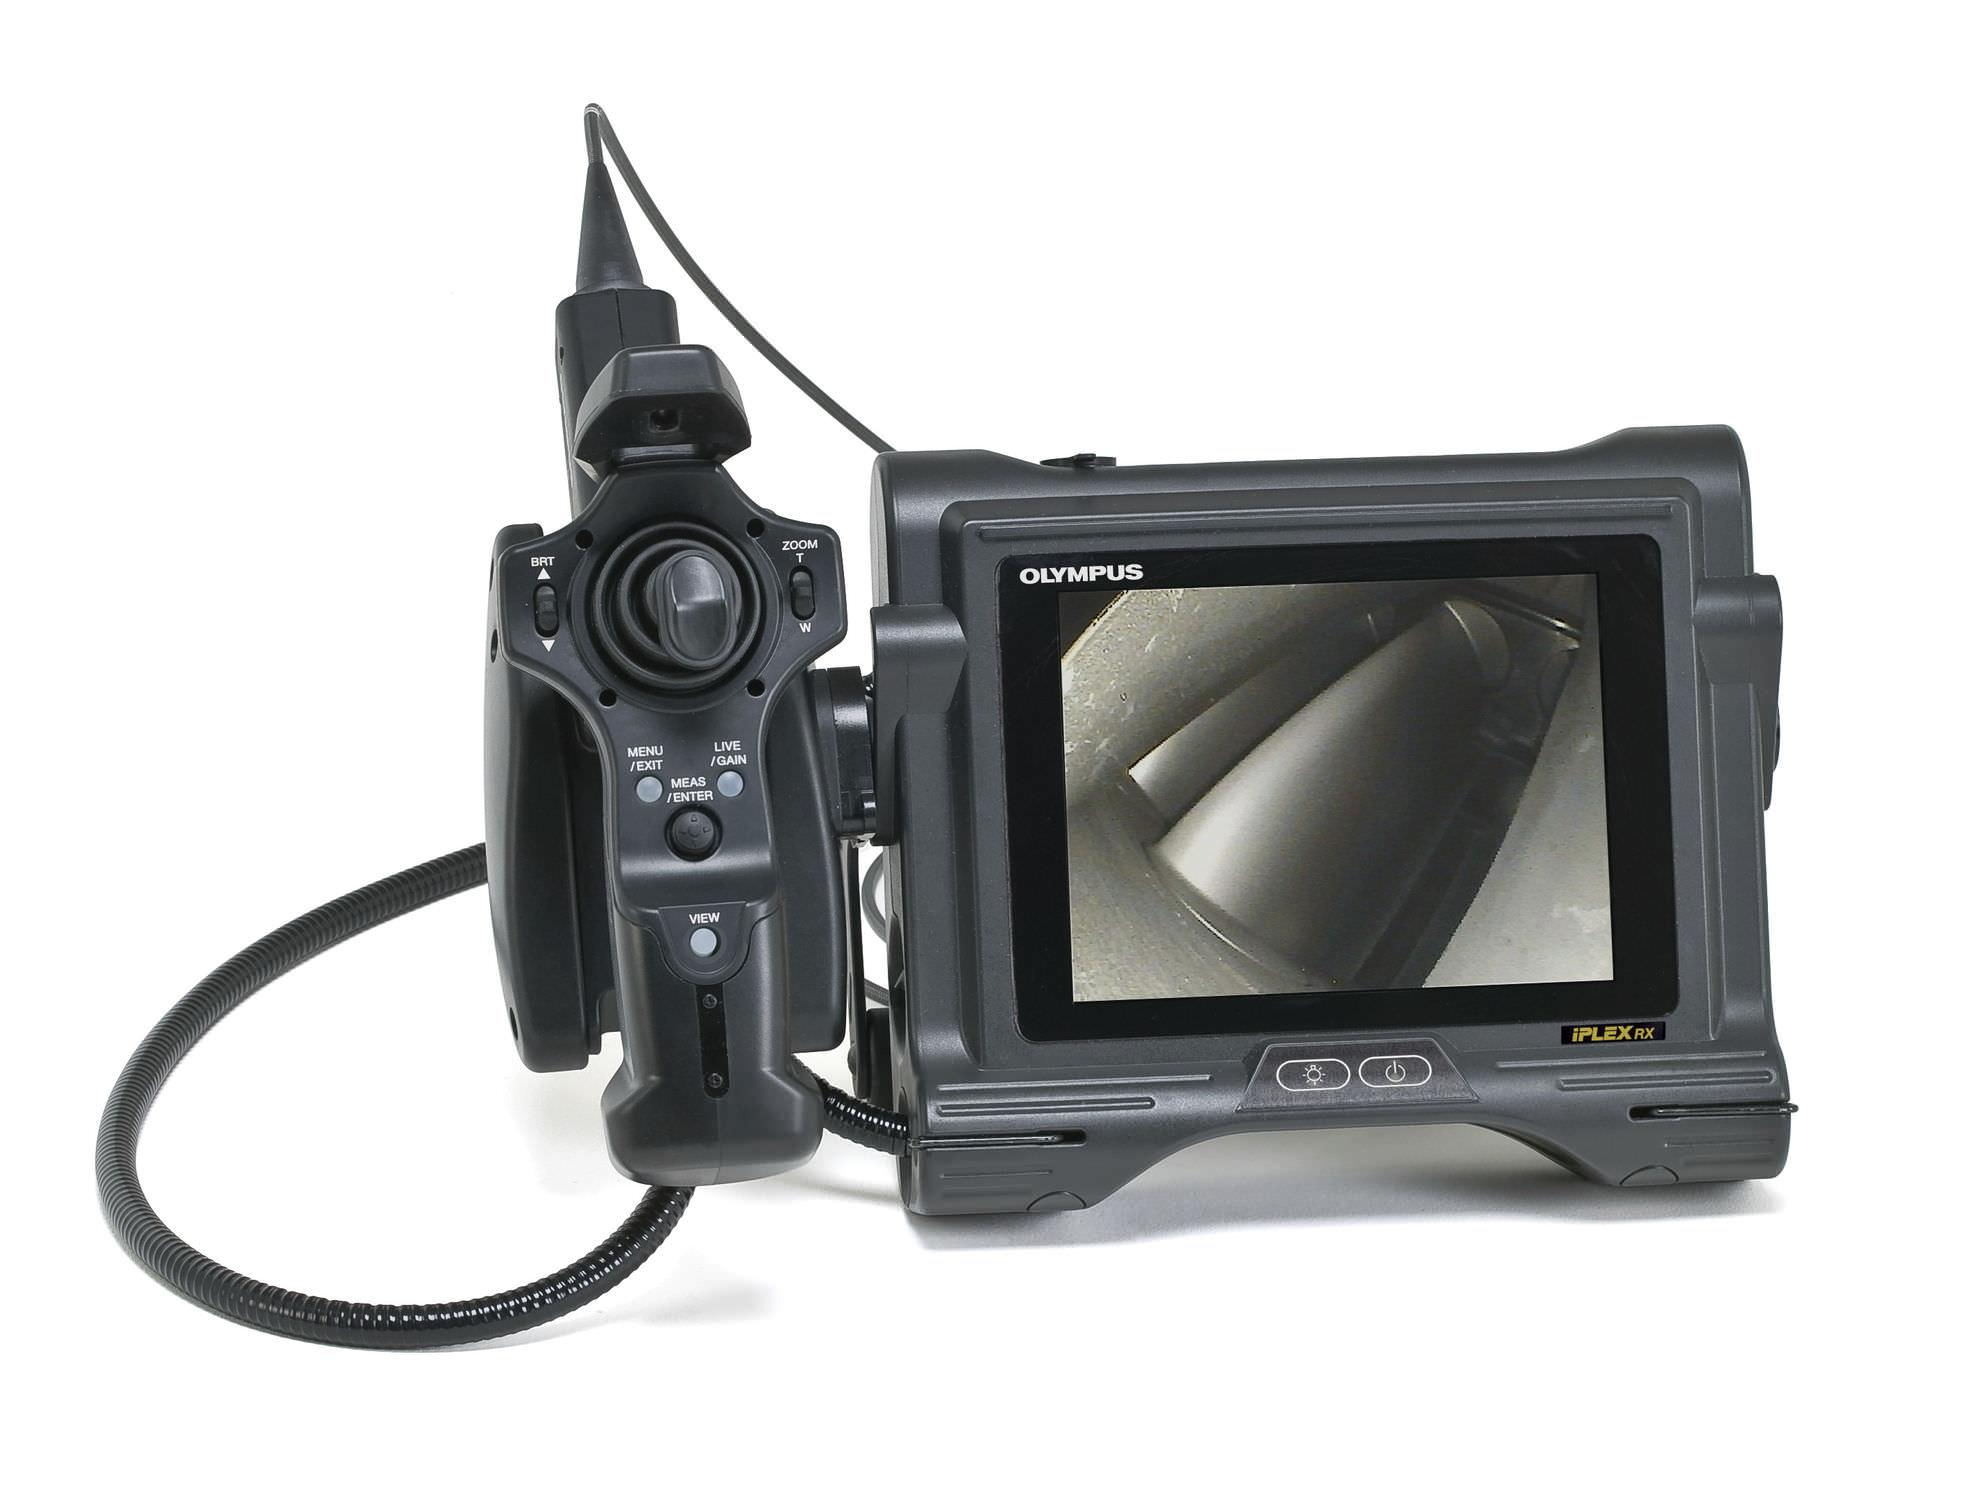 IPLEX RT - IV9435RT